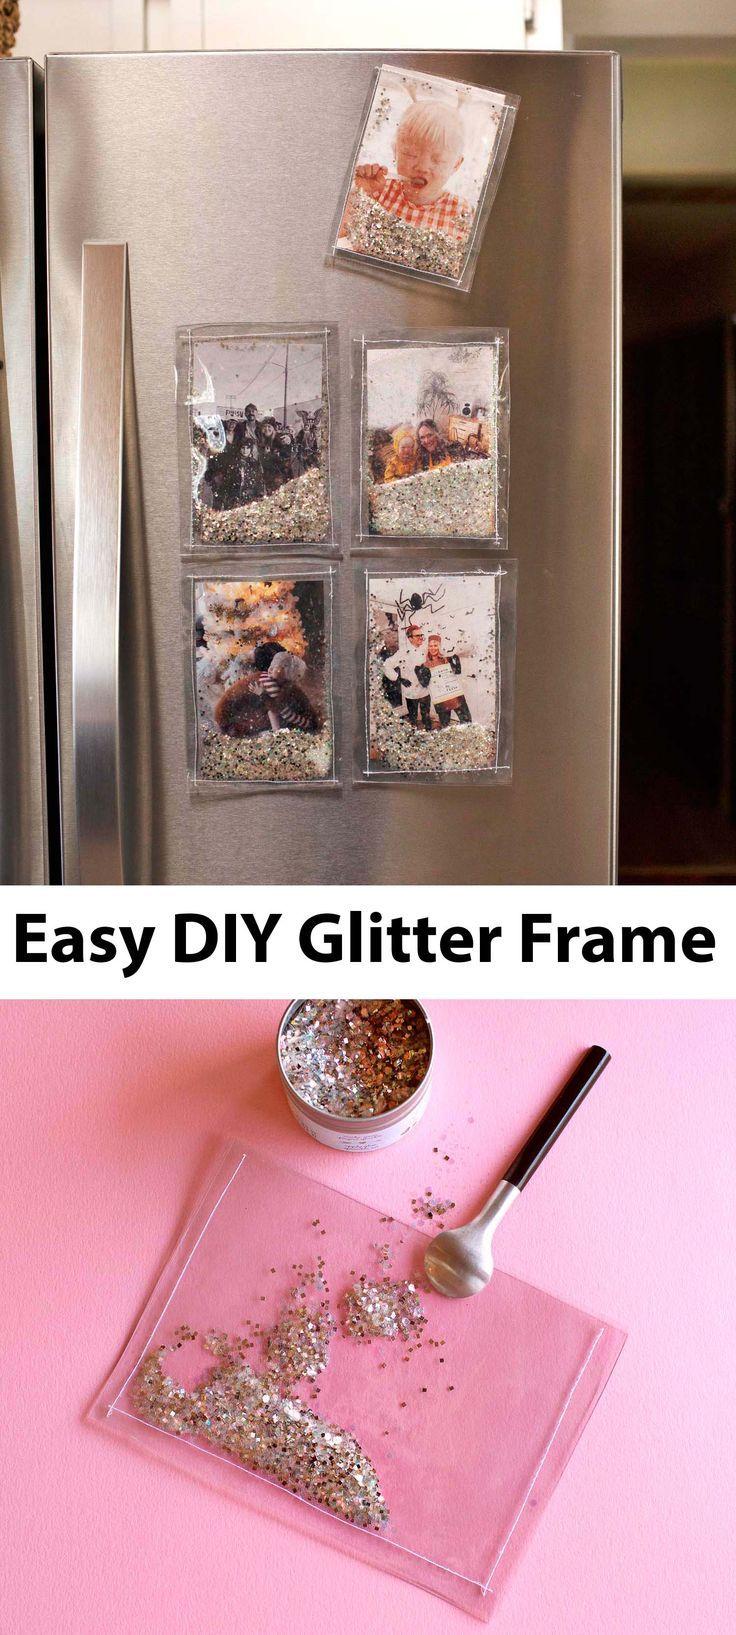 Diy Glitter Photo Frames Frames Diy Crafts Glitter Diy Projects